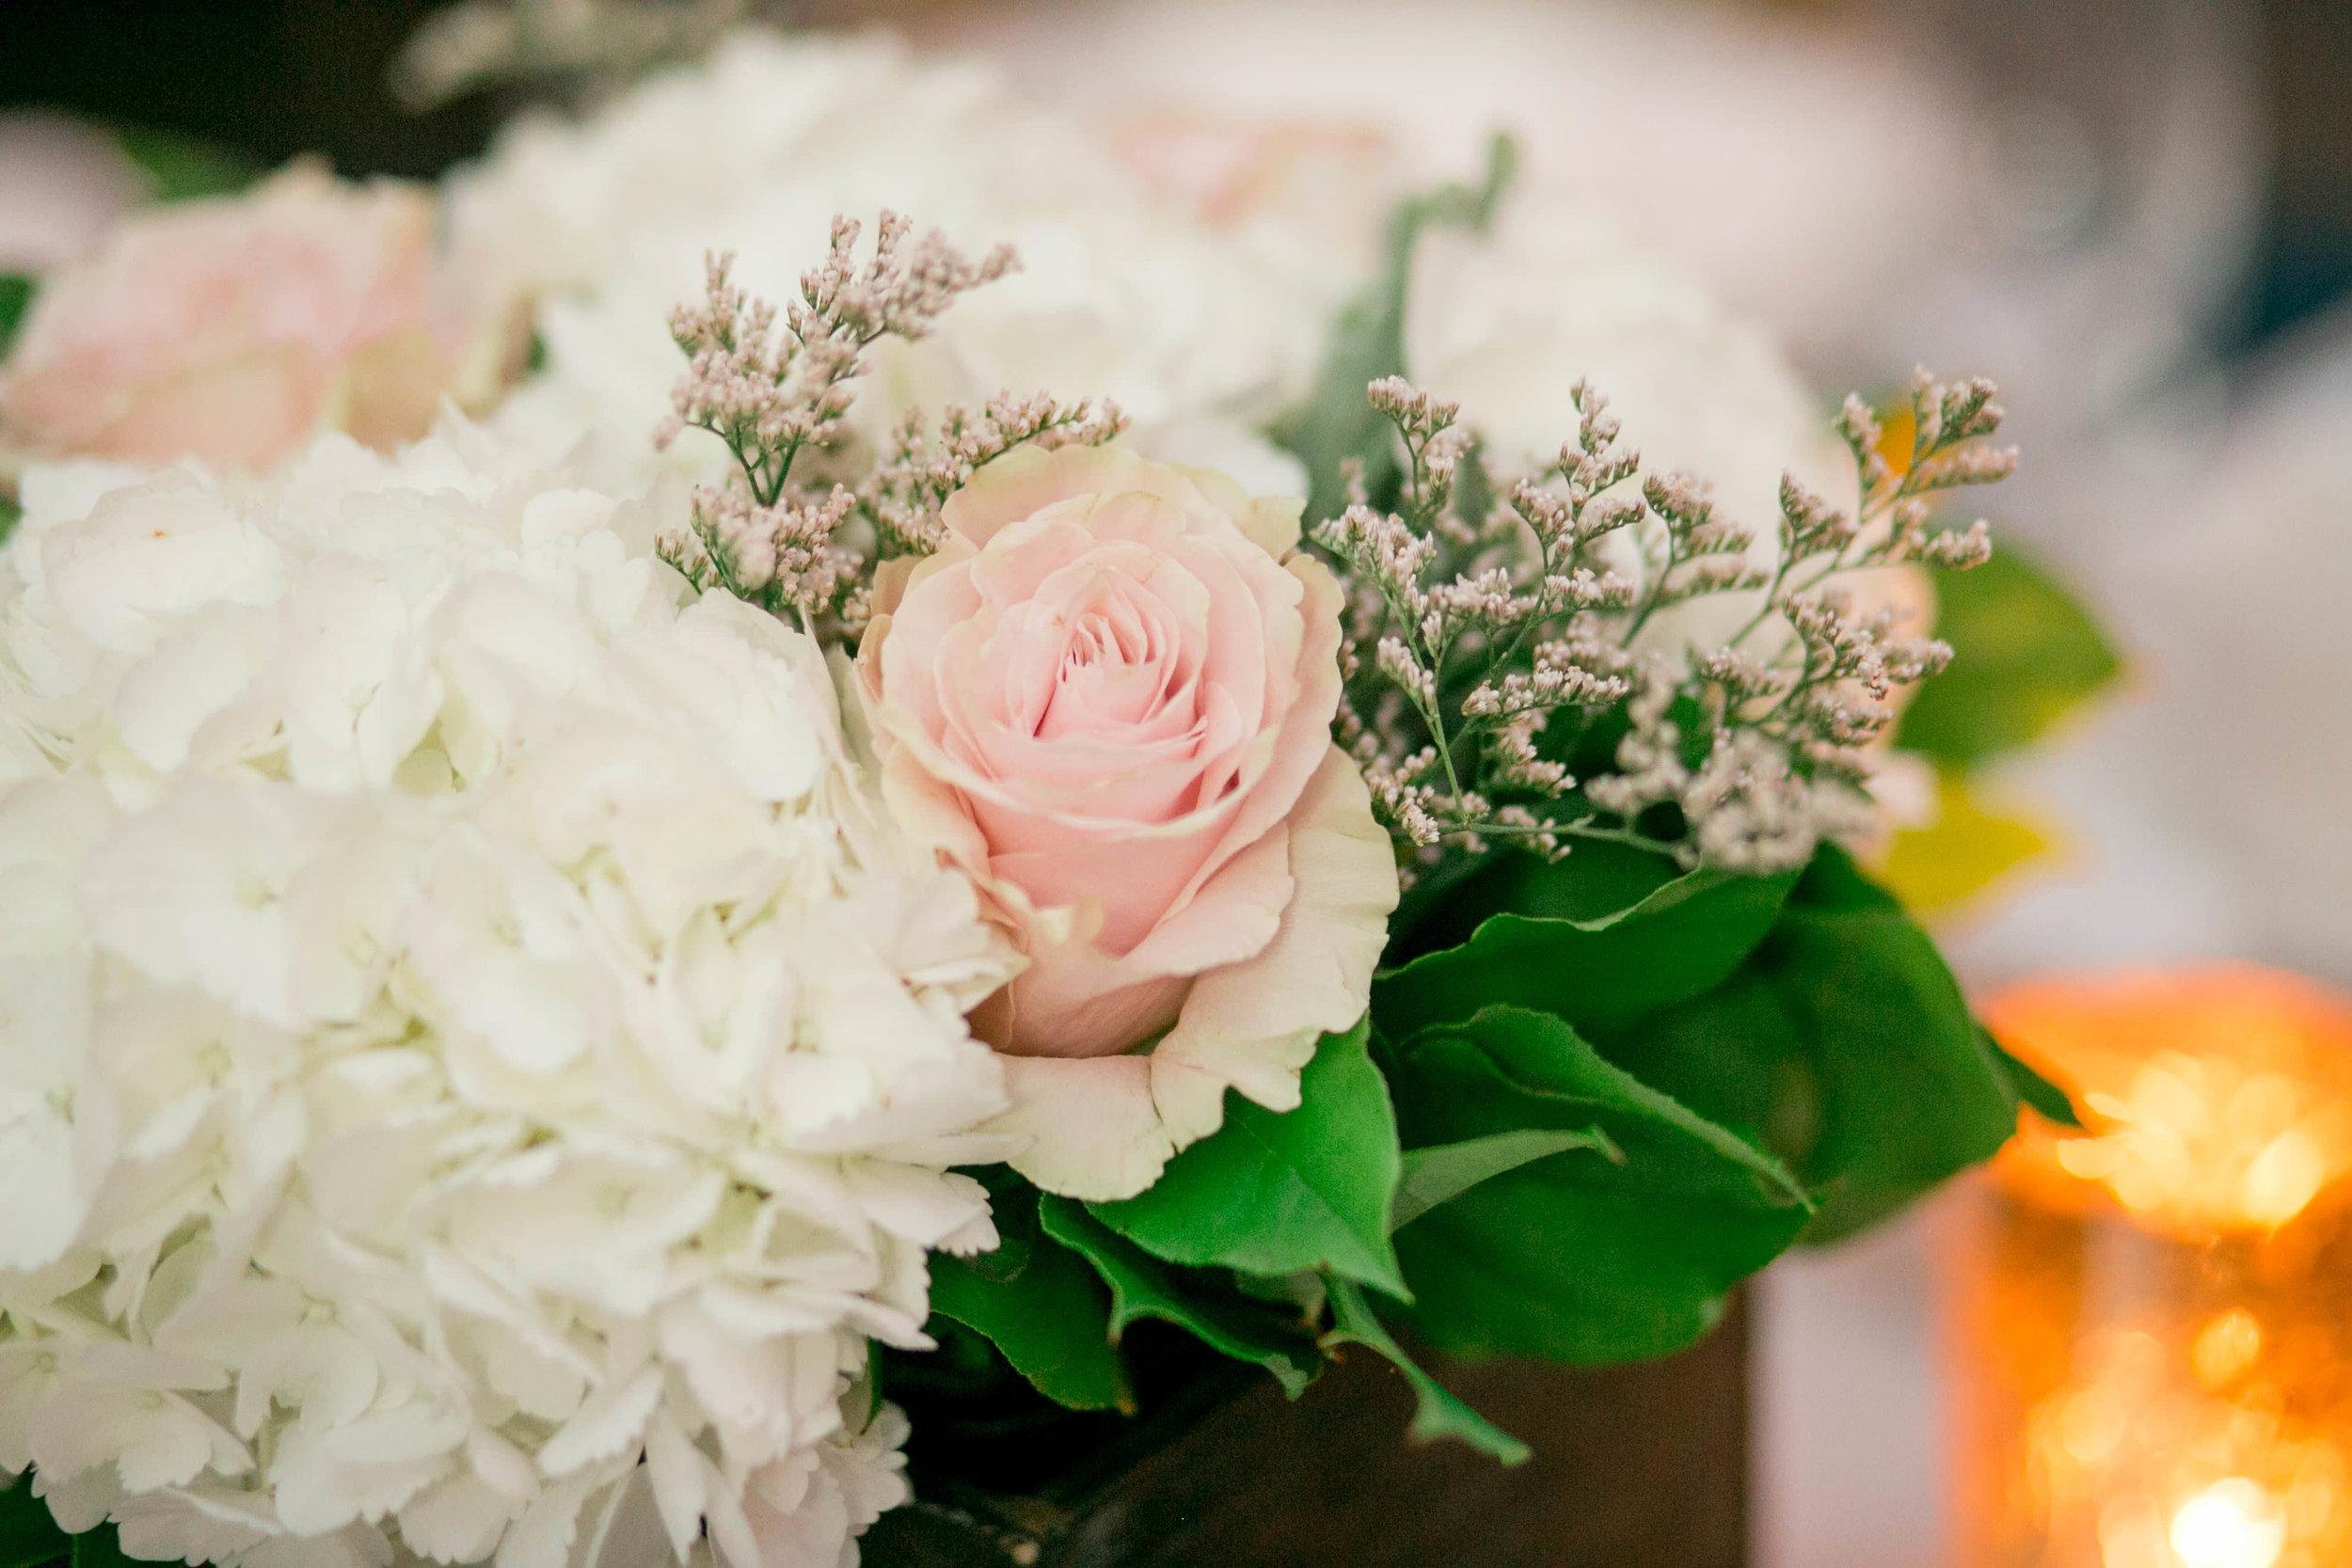 Stefanie___Bernard___Daniel_Ricci_Weddings_High_Res._Finals__423.jpg